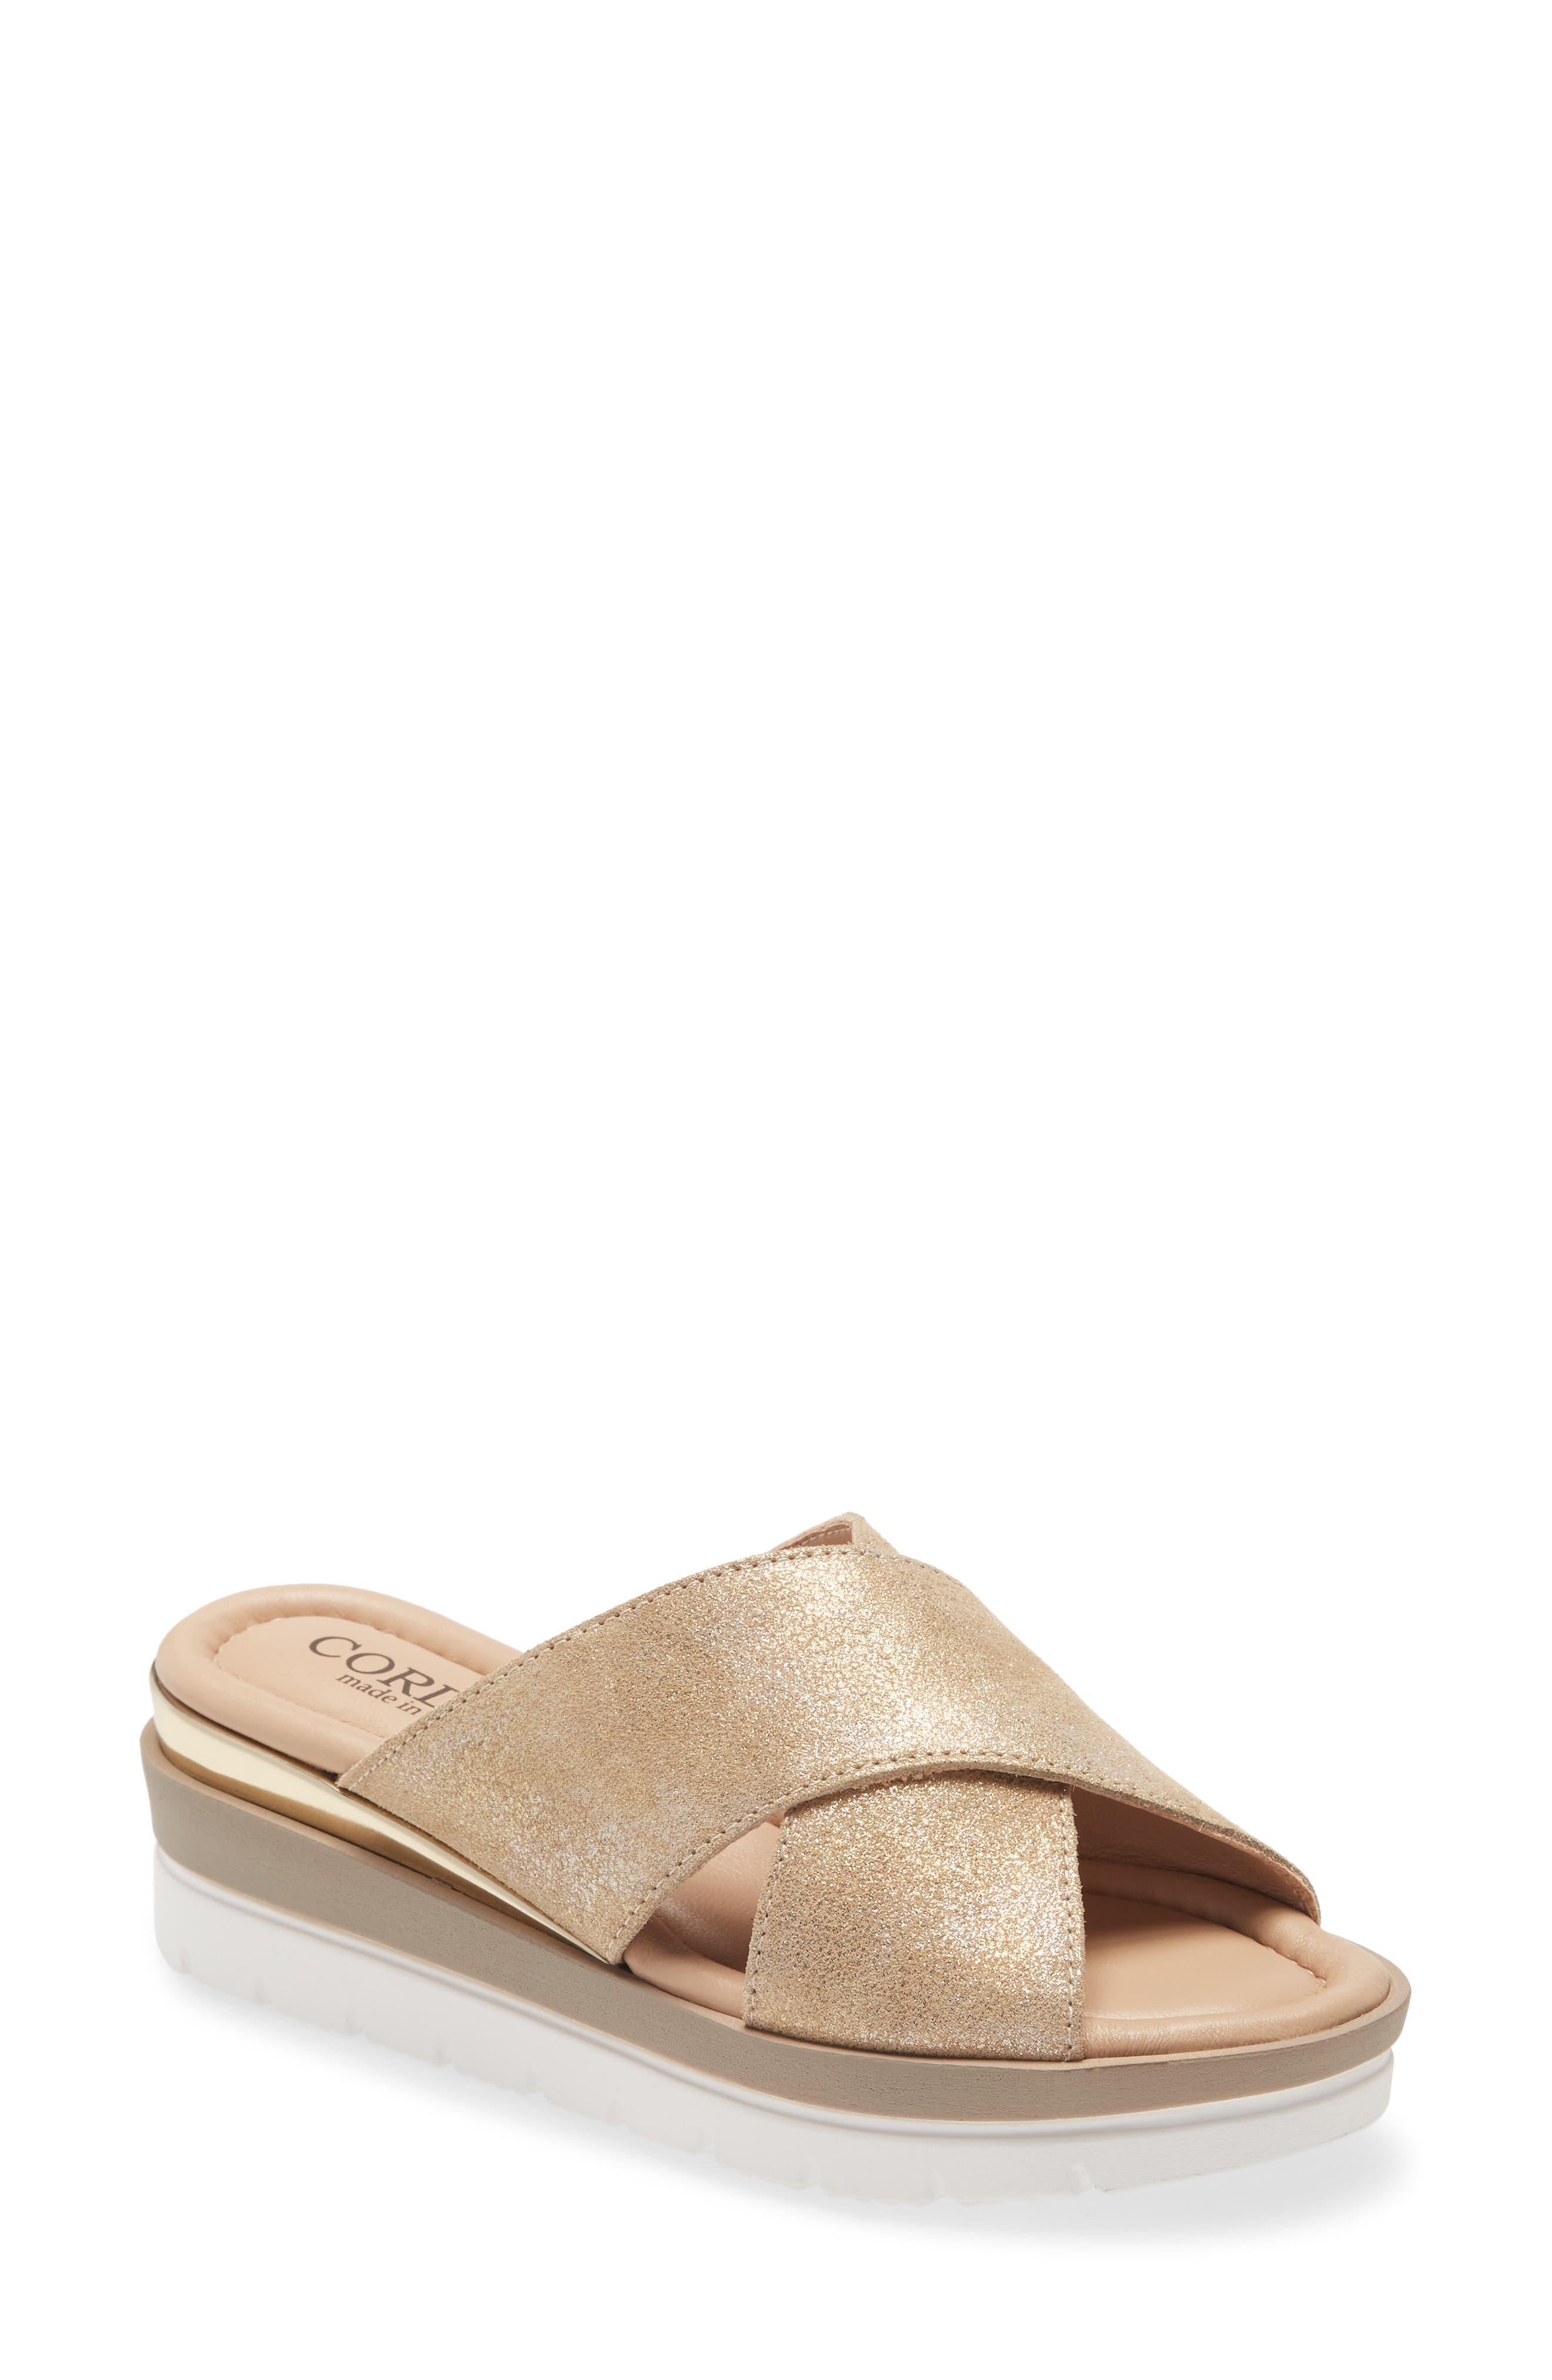 Aramis Wedge Slide Sandal